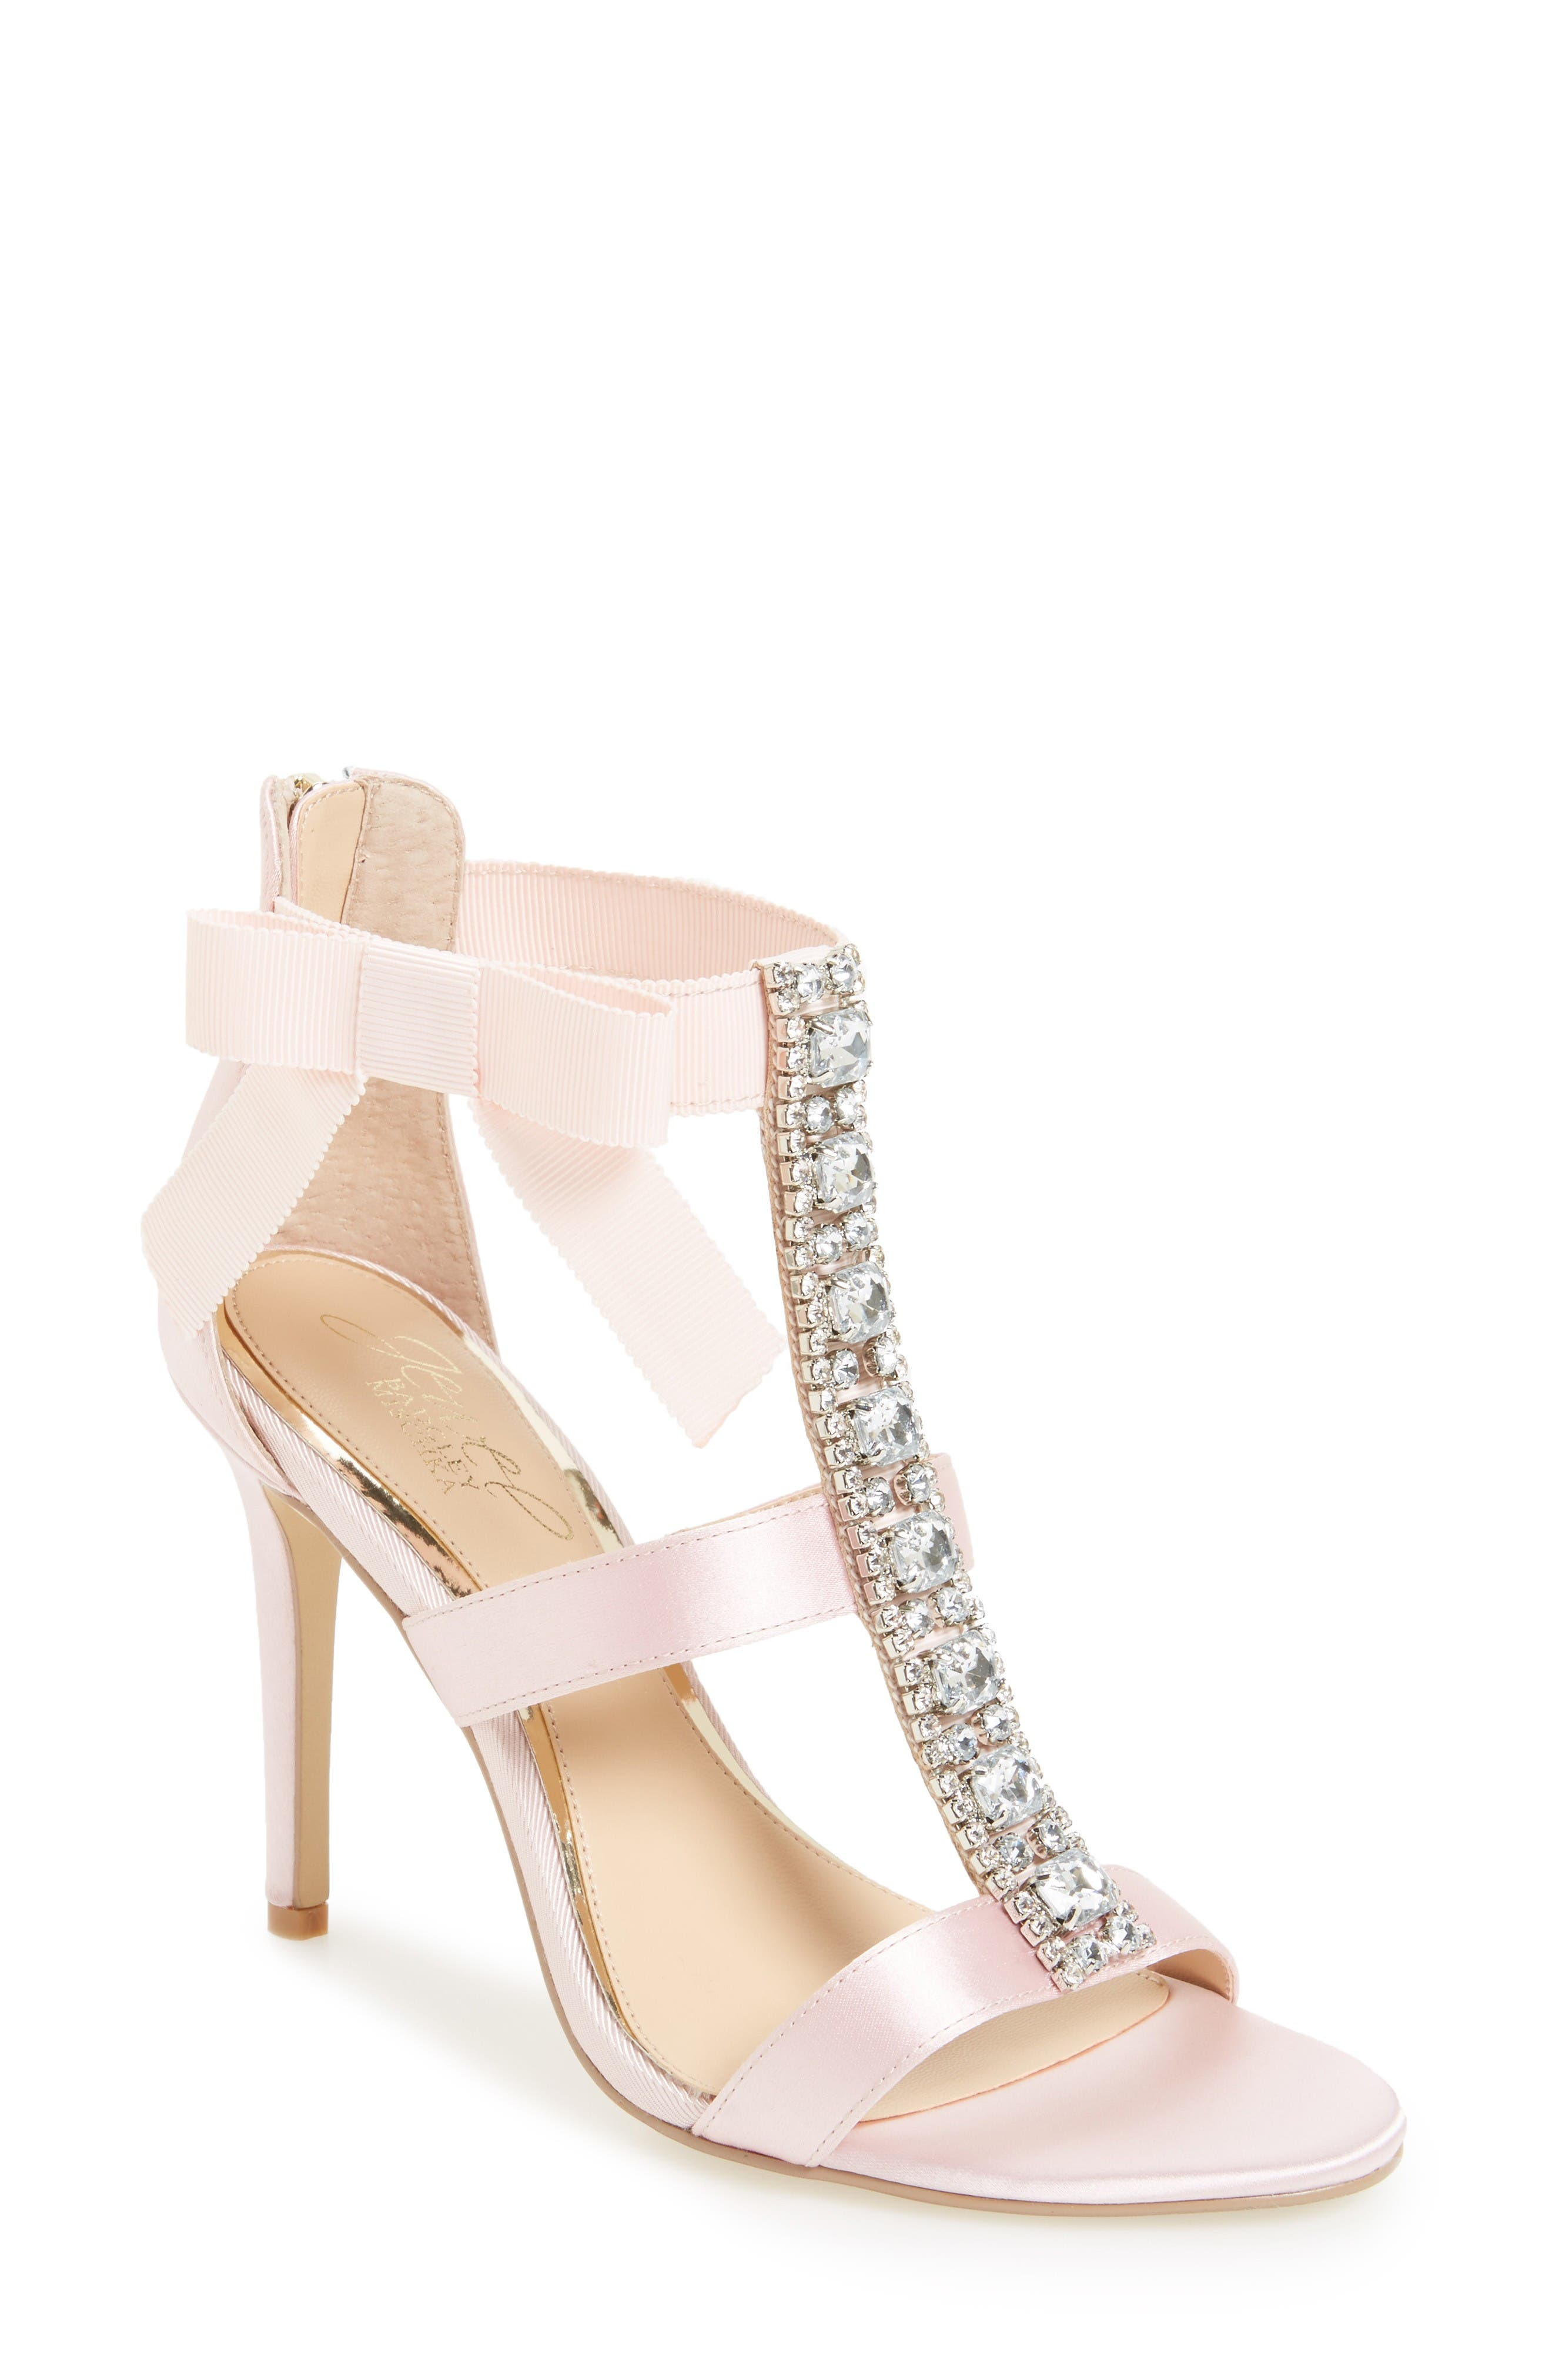 Main Image - Jewel Badgley Mischka Henderson Embellished Bow Sandal (Women)